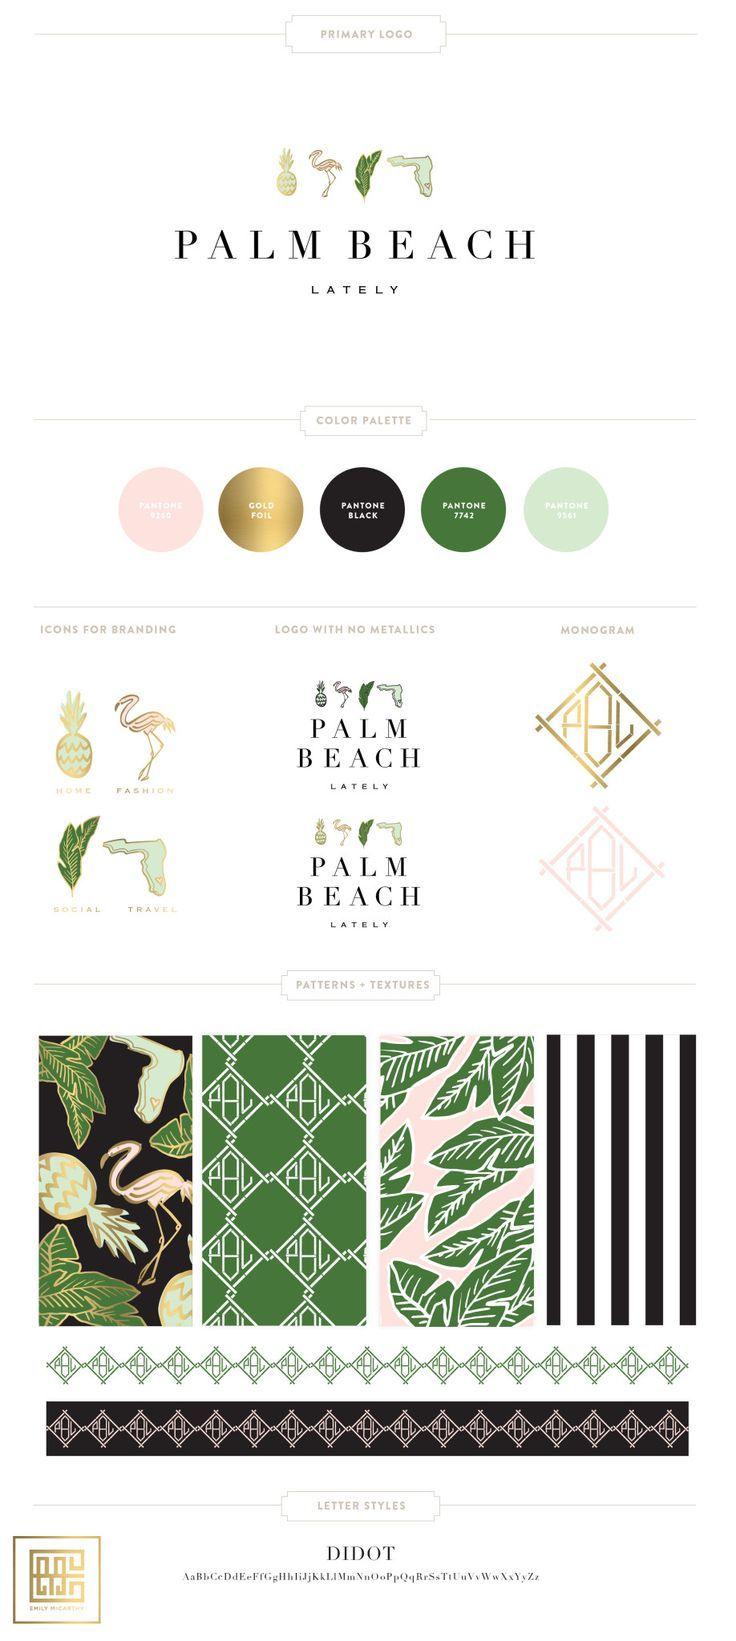 Emily McCarthy Brand   Palm Beach Lately Branding Board   http://www.emilymccarthy.com #branding